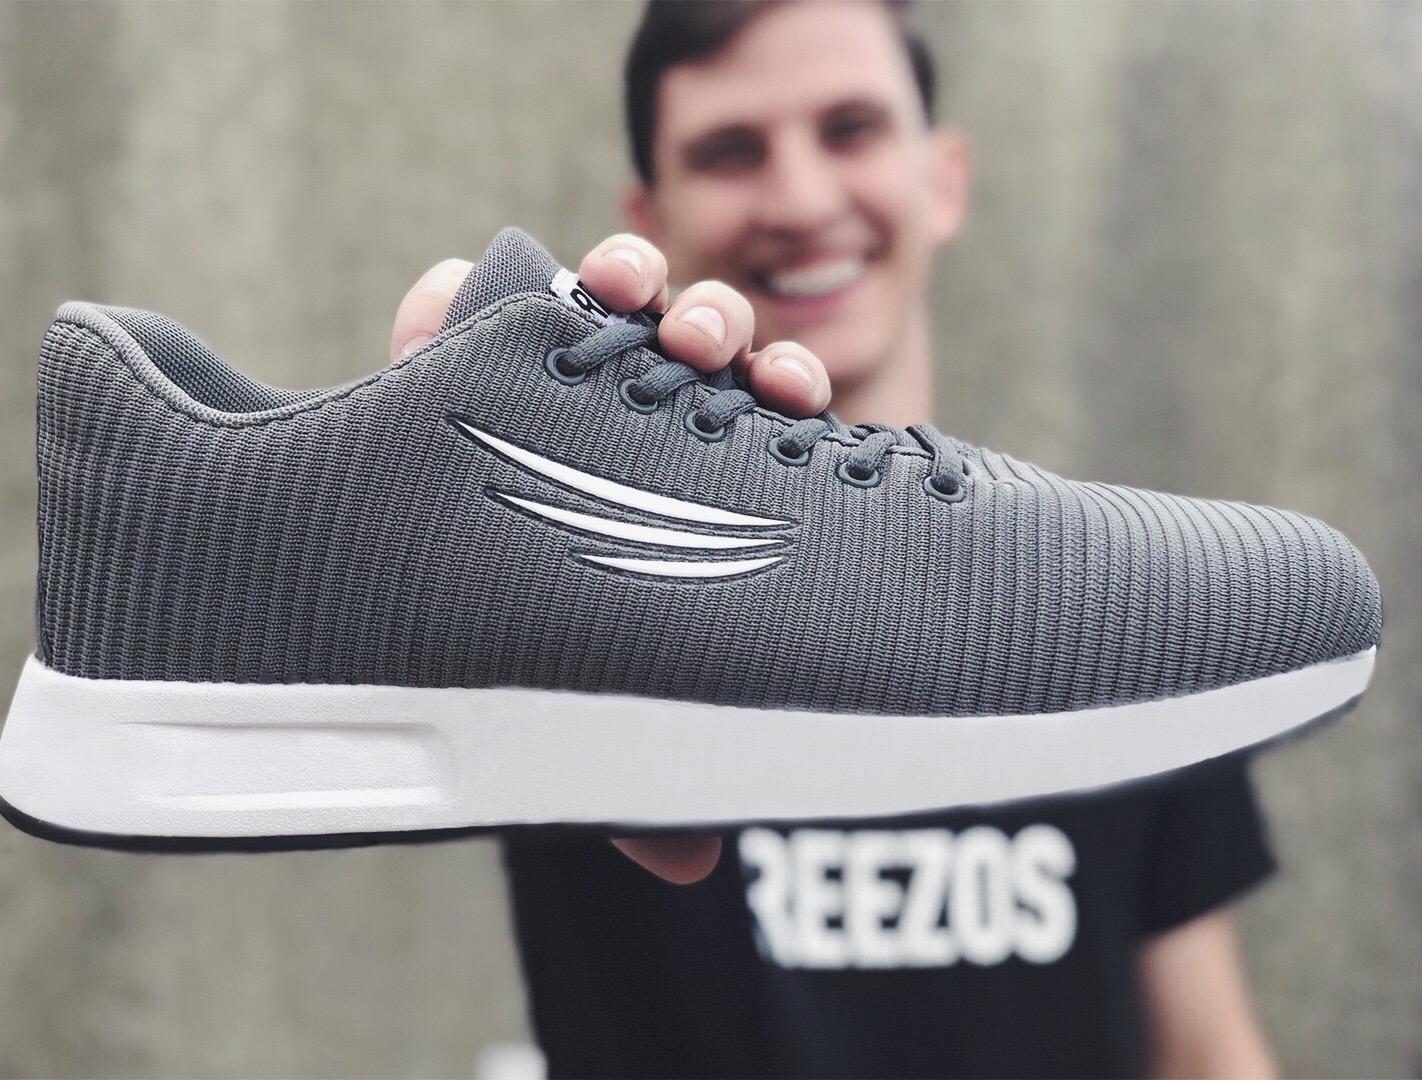 Vanderbilt alum Reese Wilson launches Reezos, a shoe line that gives back